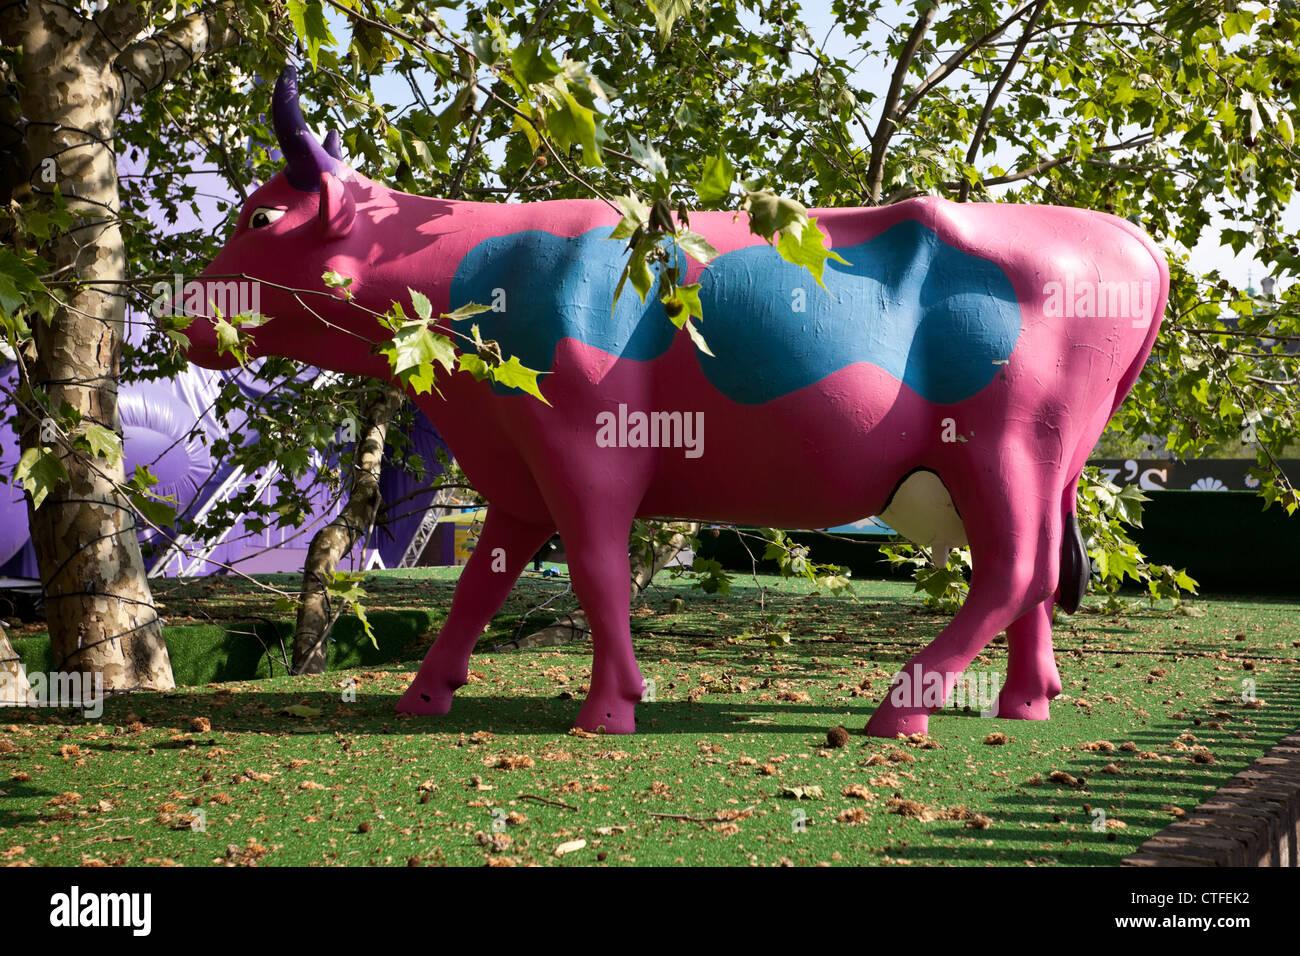 Magners Pastures, E4 Udderbelly Festival, Southbank, London, England, UK - Stock Image